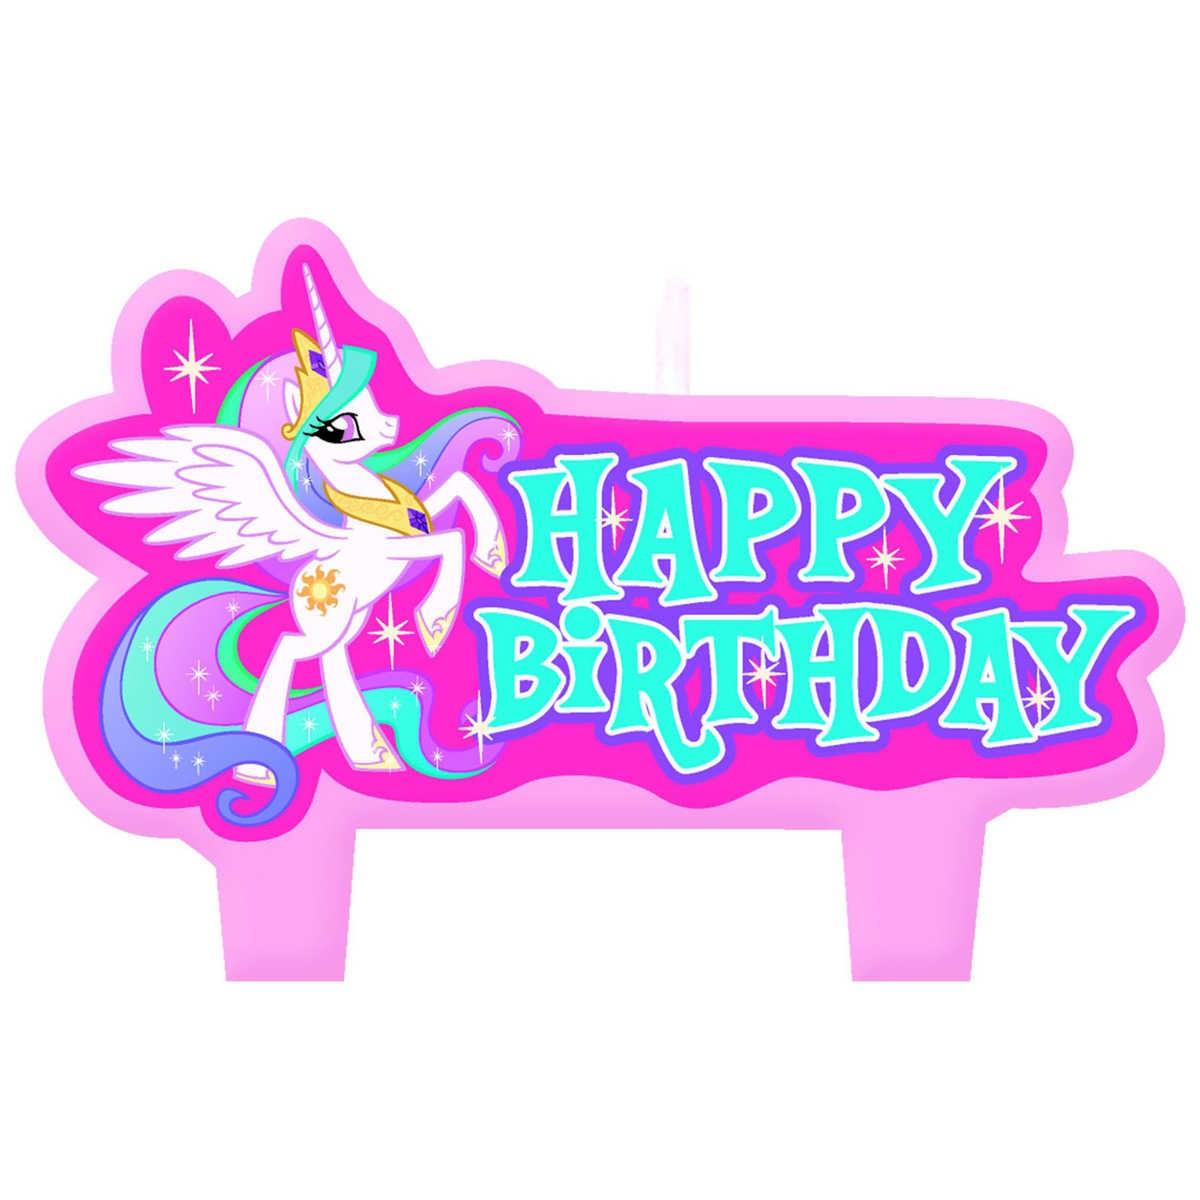 My litte pony happy birthday words clipart jpg royalty free download My Little Pony Birthday Candle Set jpg royalty free download